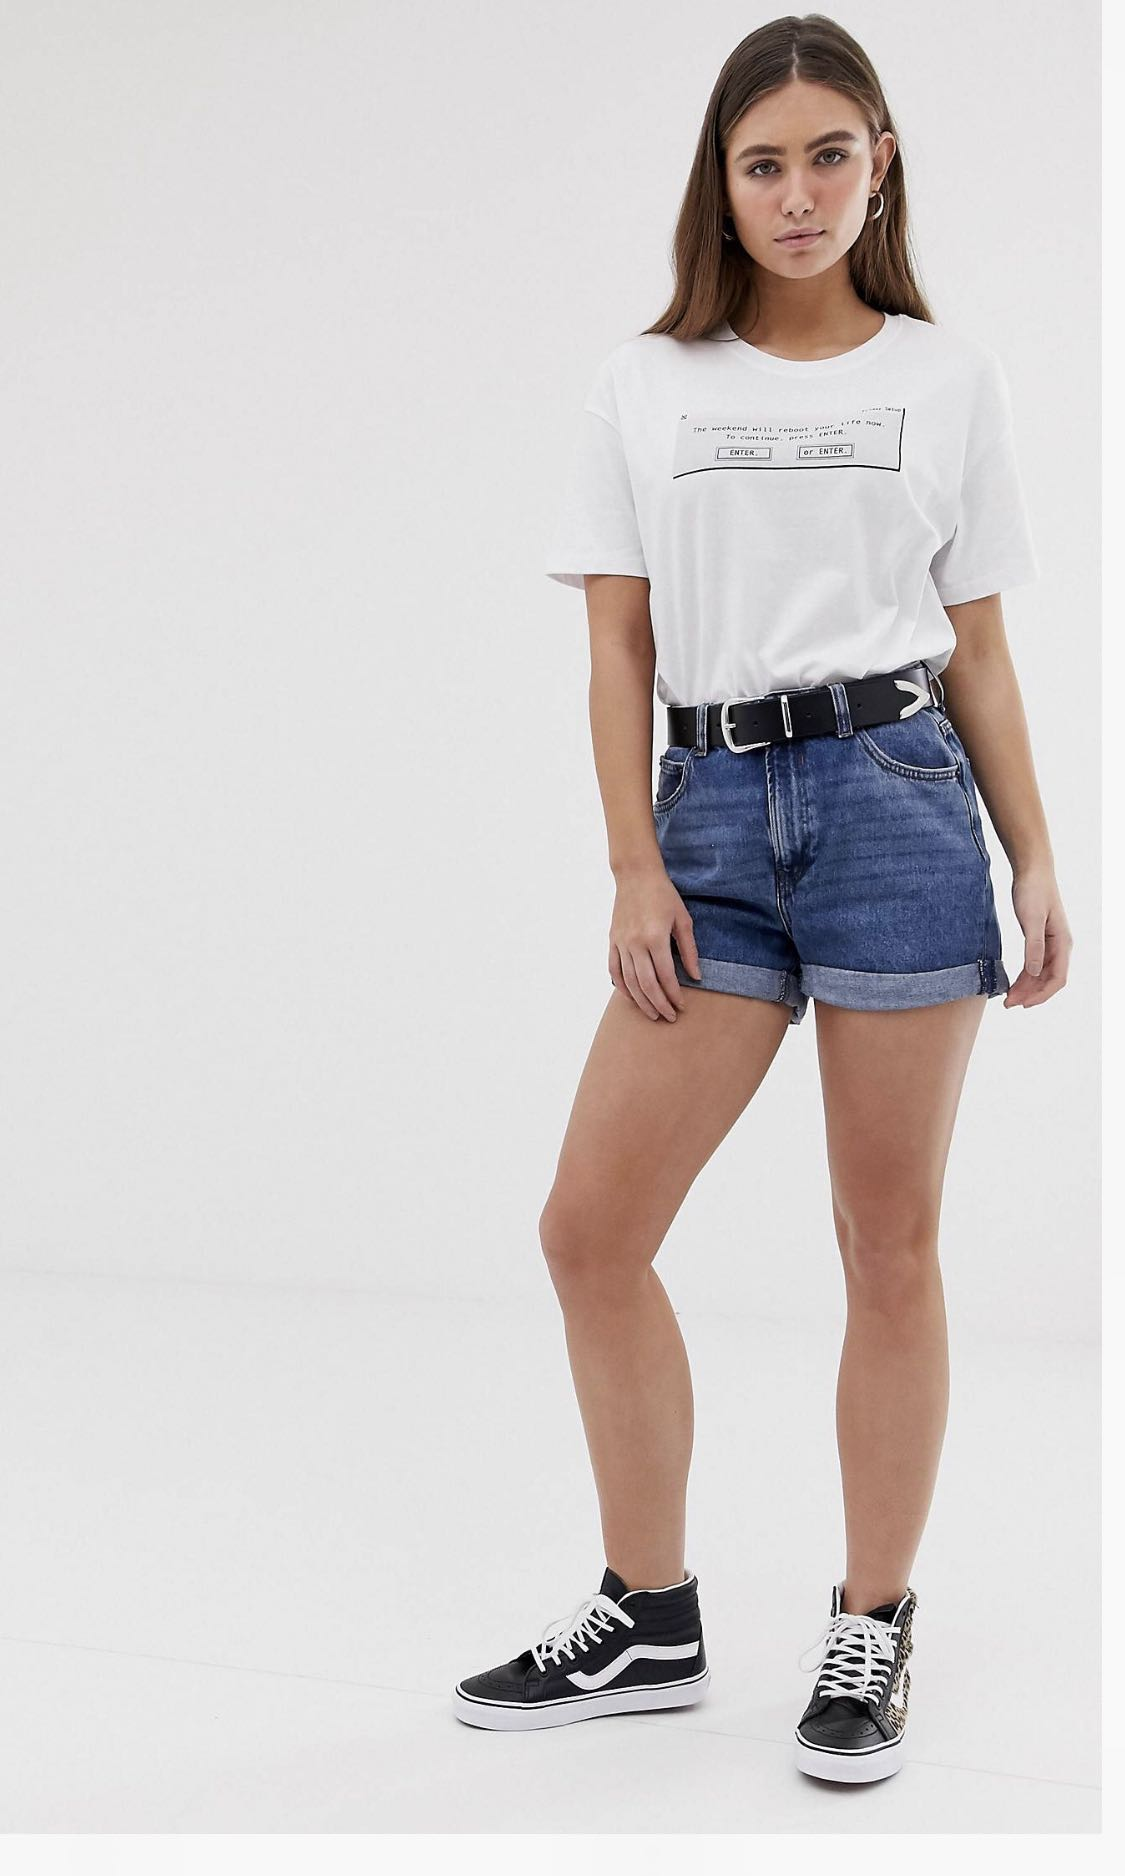 55cc763c78 Bershka denim shorts, Women's Fashion, Clothes, Pants, Jeans & Shorts on  Carousell